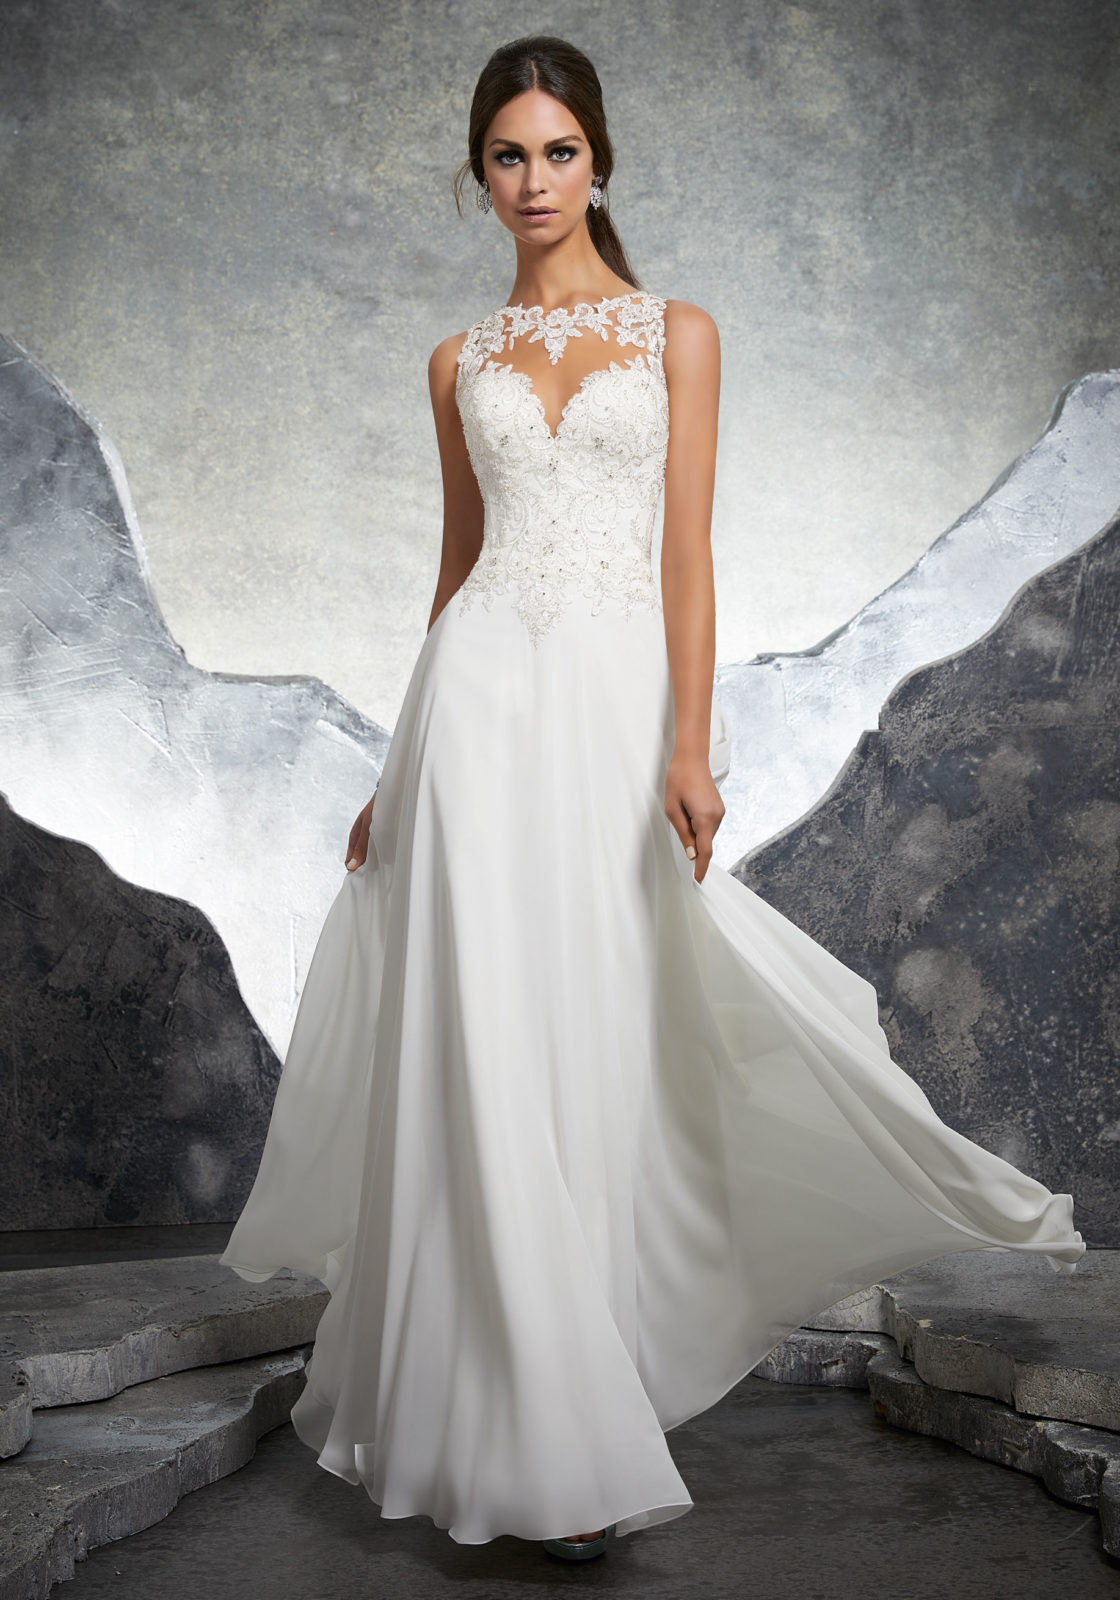 Mori Lee Wedding Dresses | Devon | Frilly Frocks